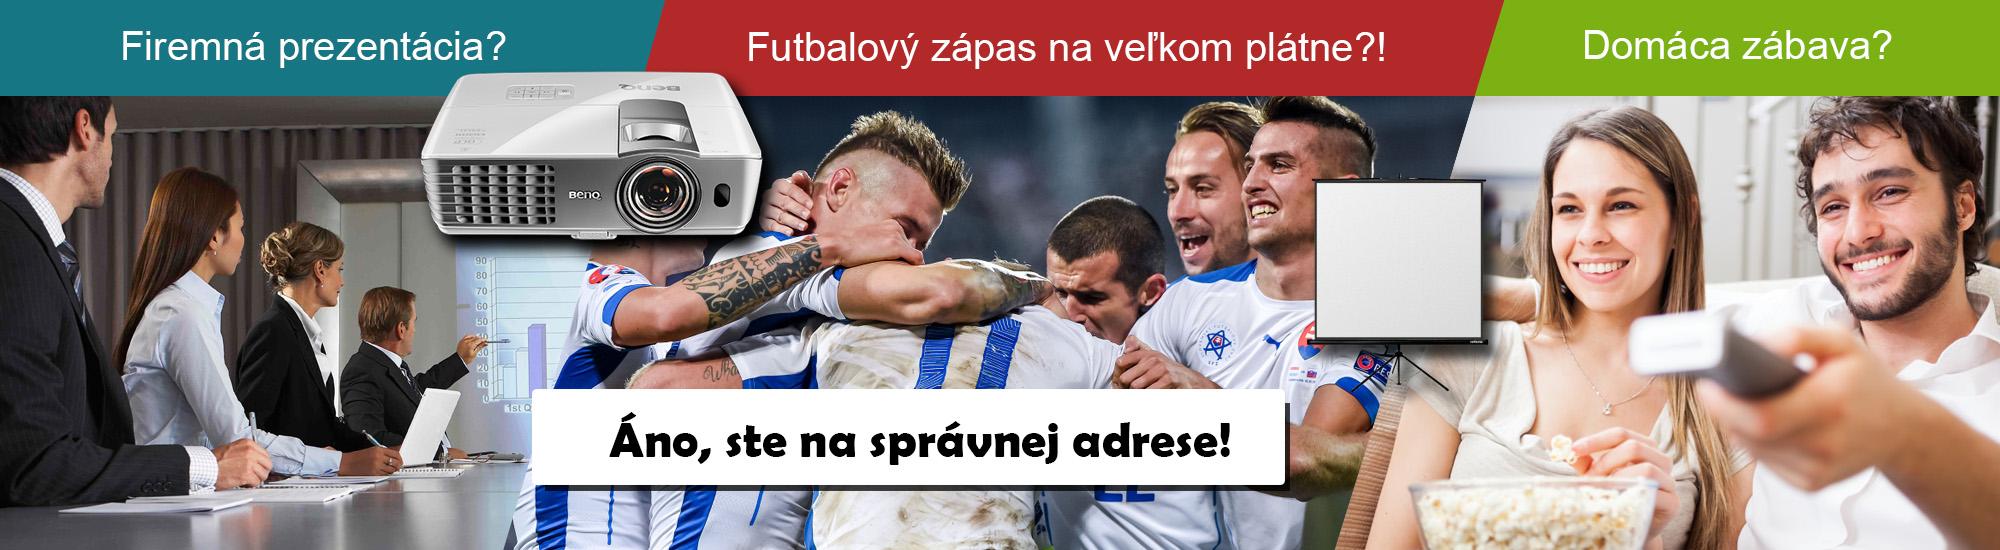 banner-futbal